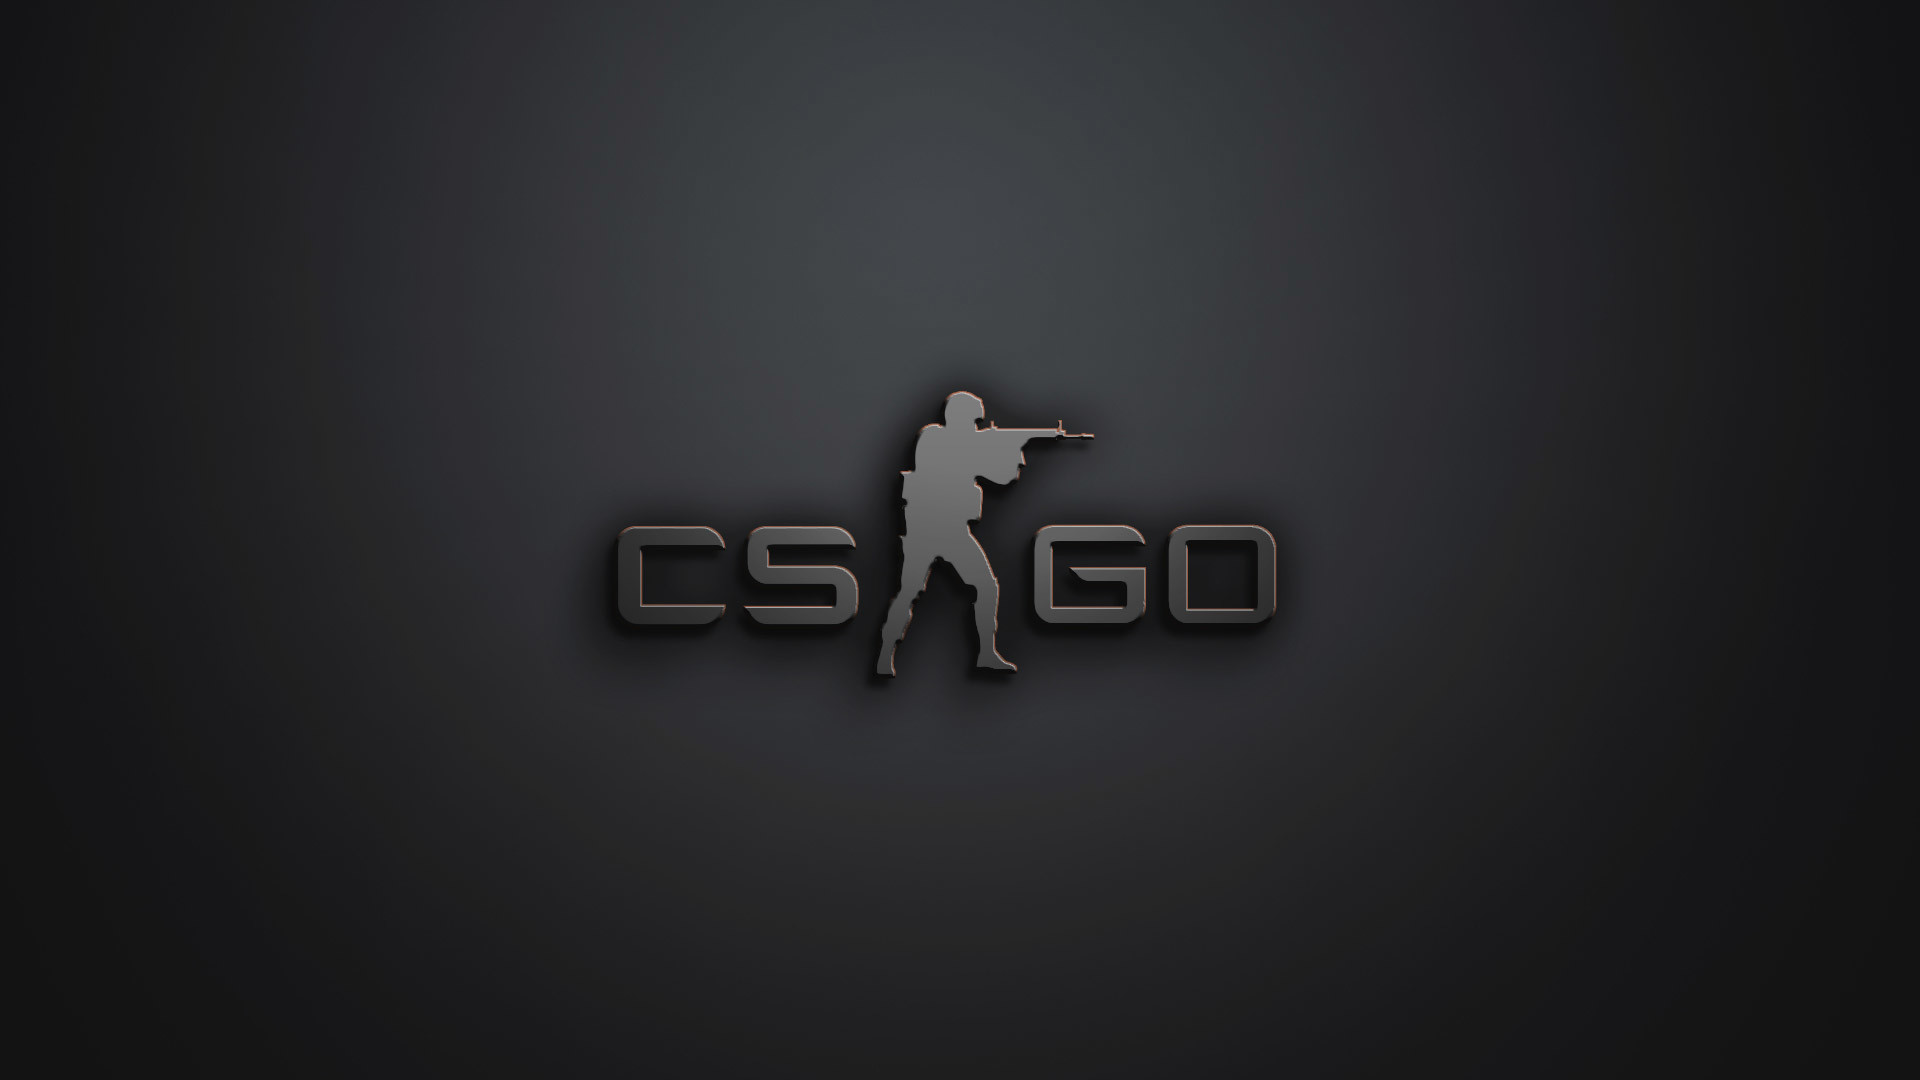 CSGO Wallpaper › Gaming